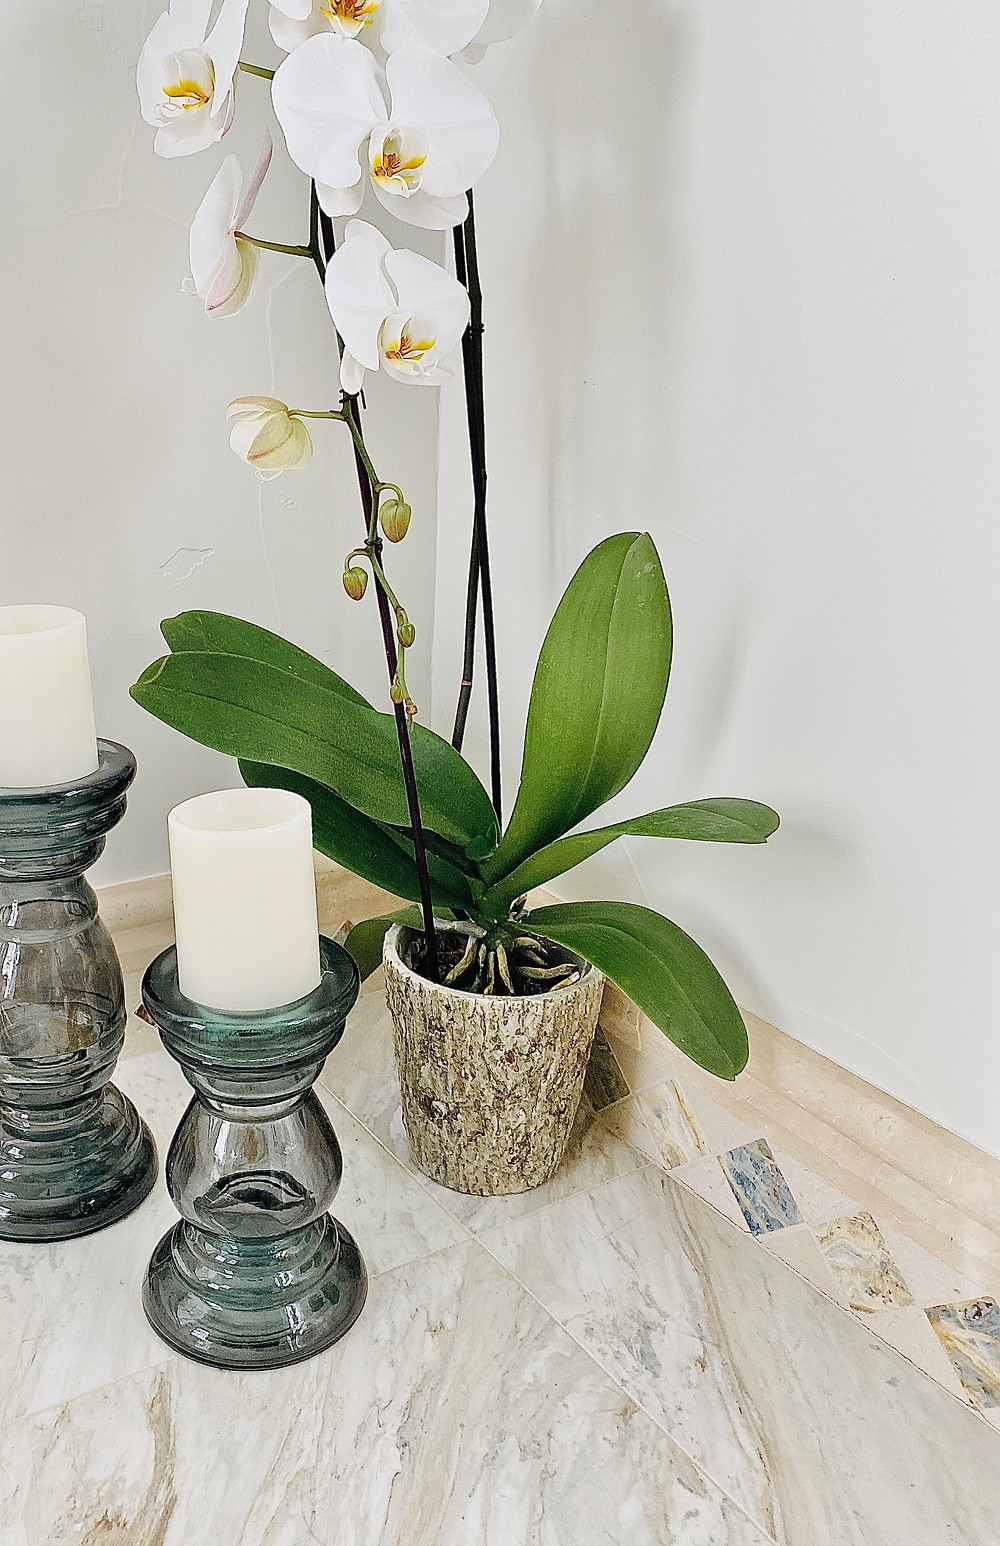 marble bathroom, orchids, fancy bathroom